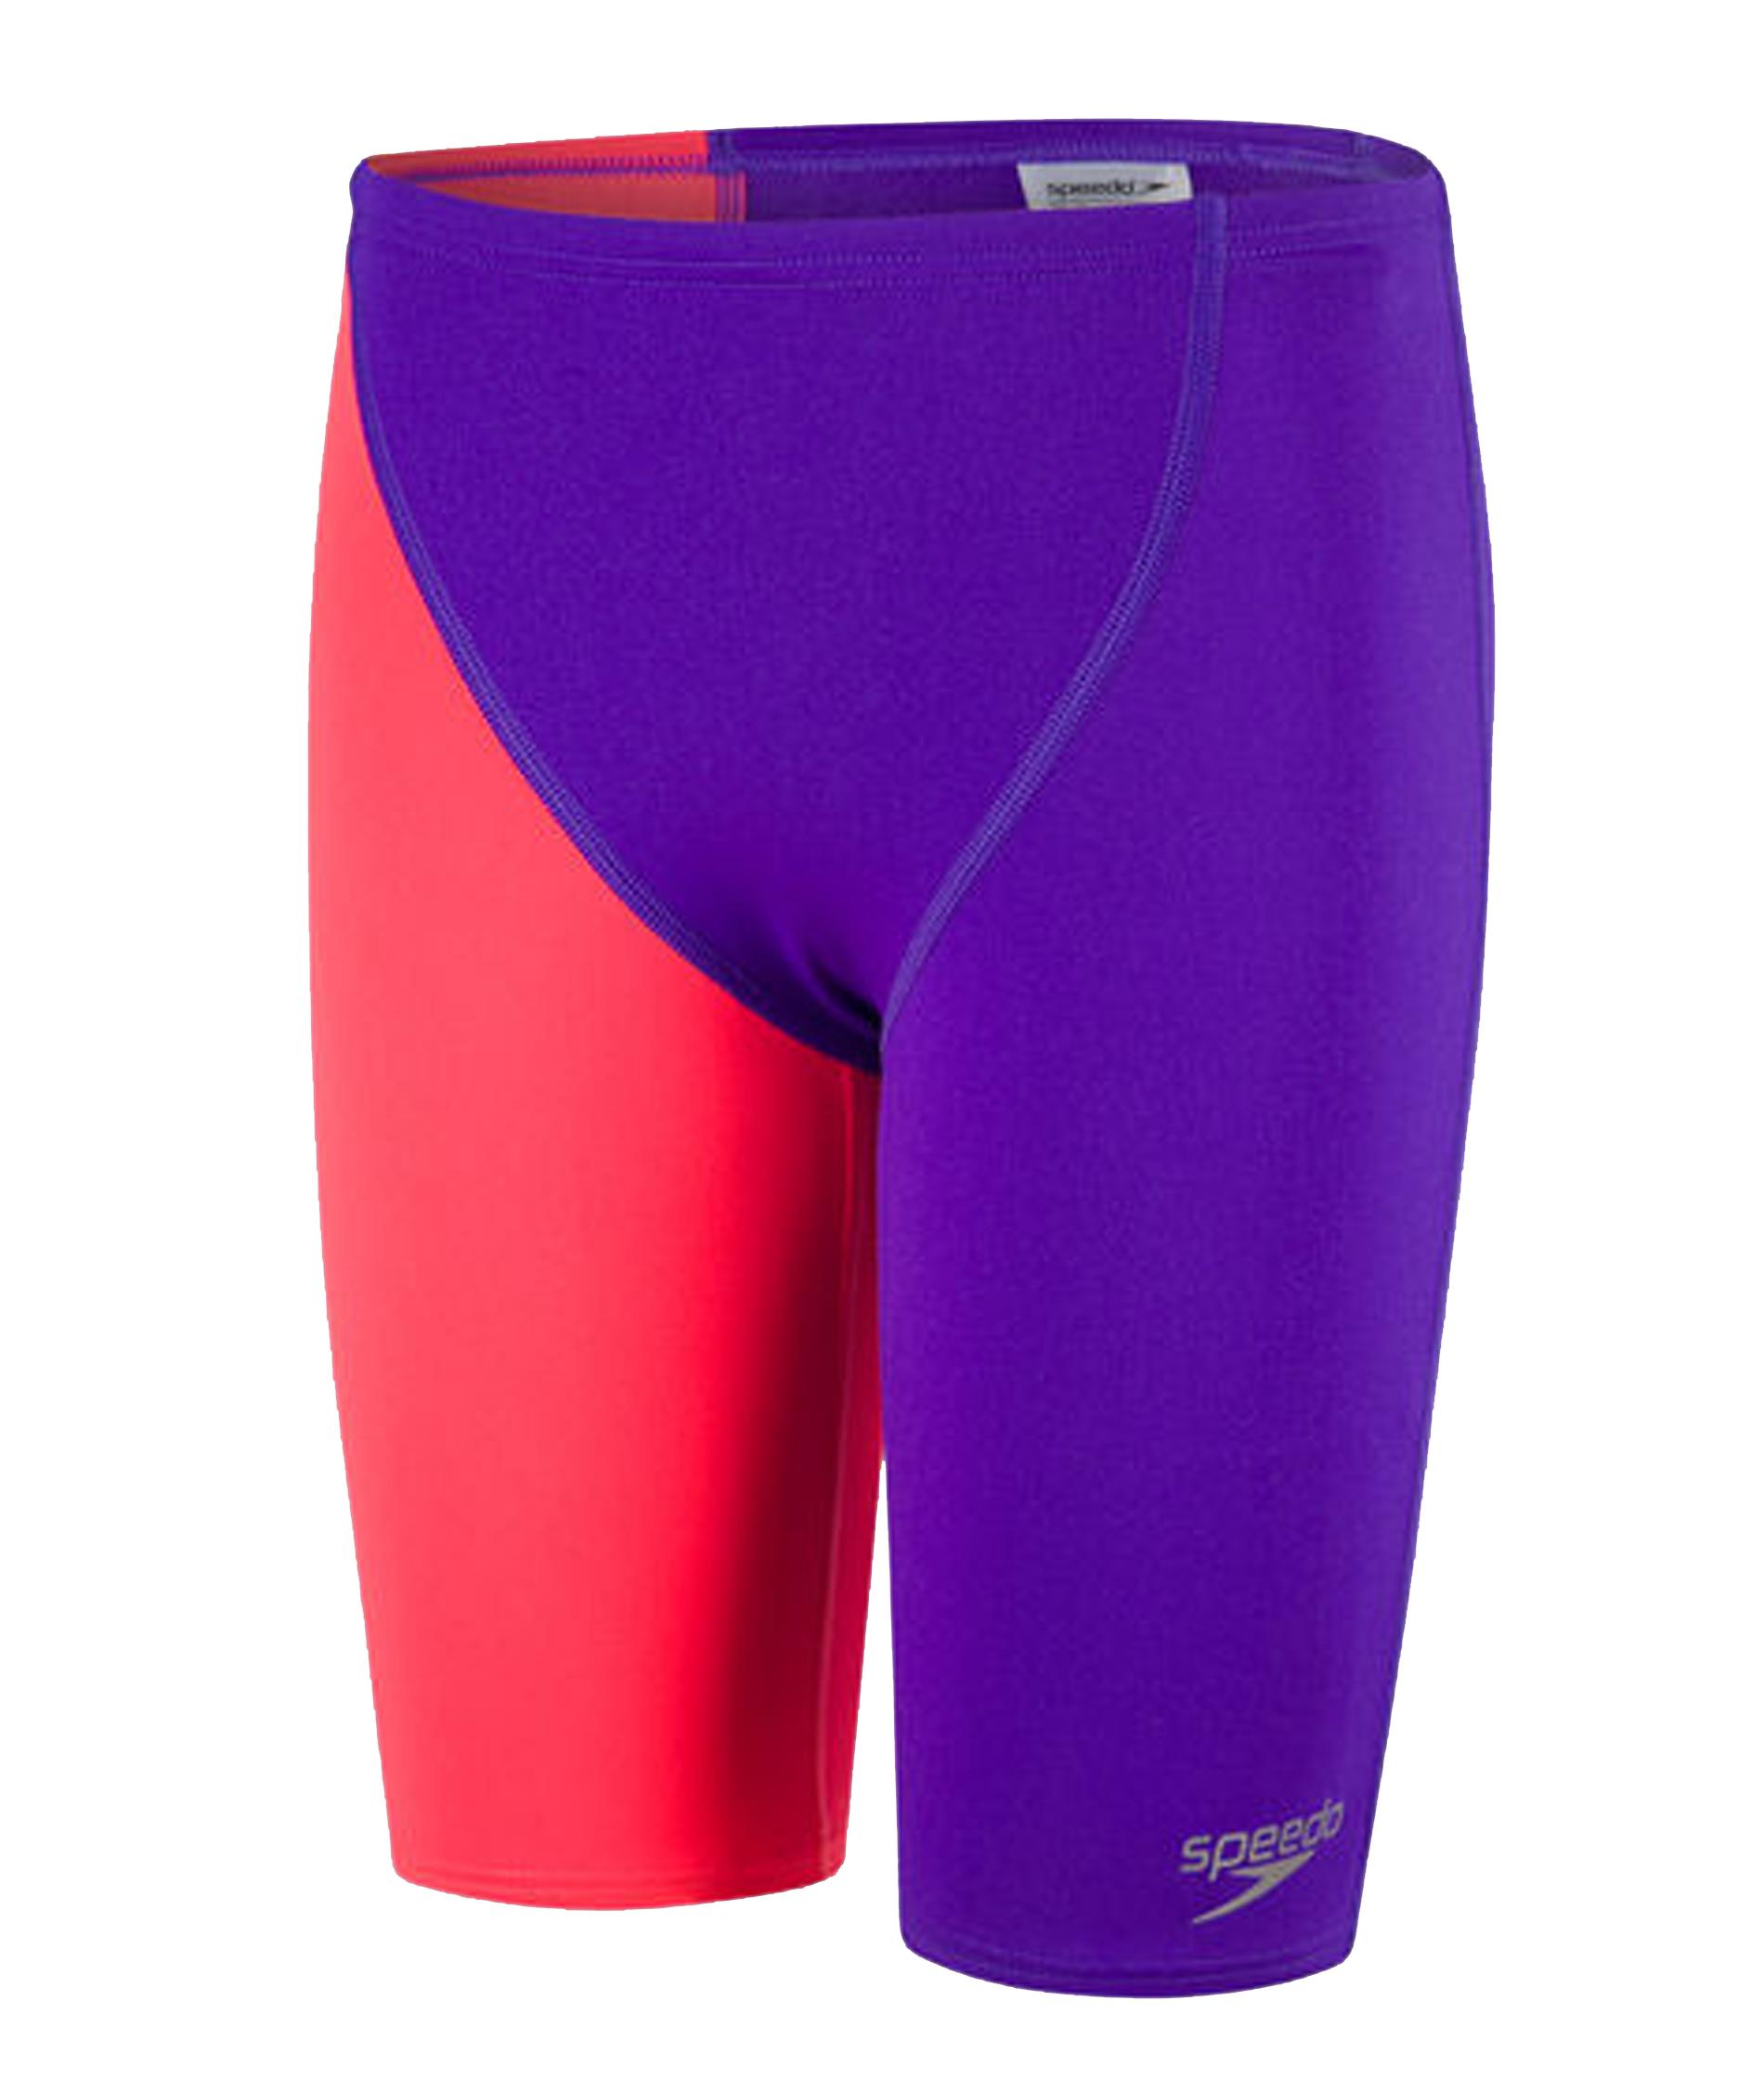 Speedo Junior Fastskin Endurance+ High Waisted Jammer - Purple/Red (32)